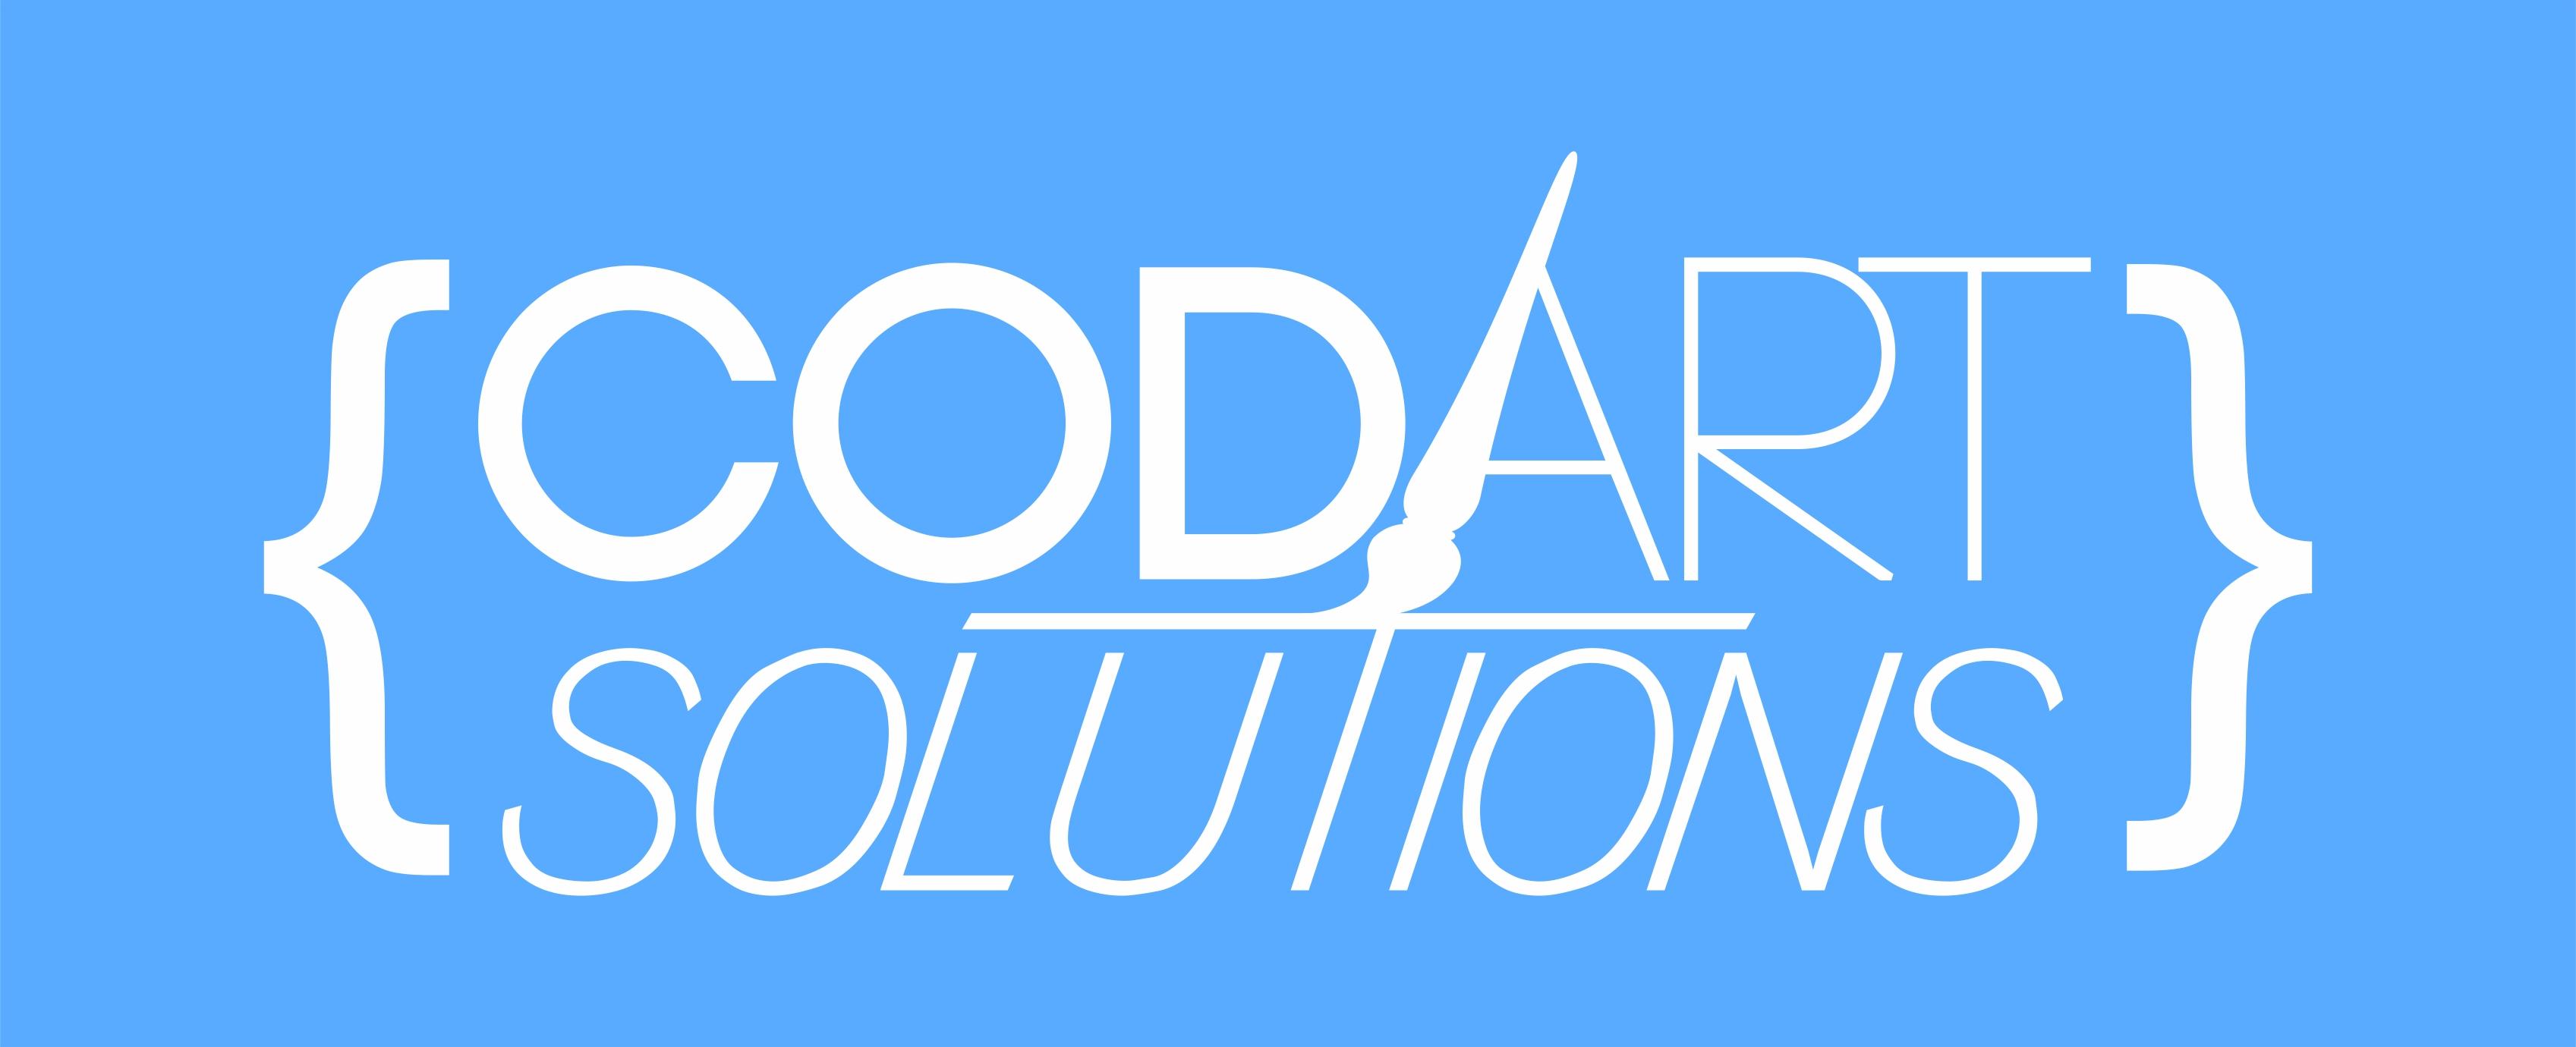 logo CODArt0